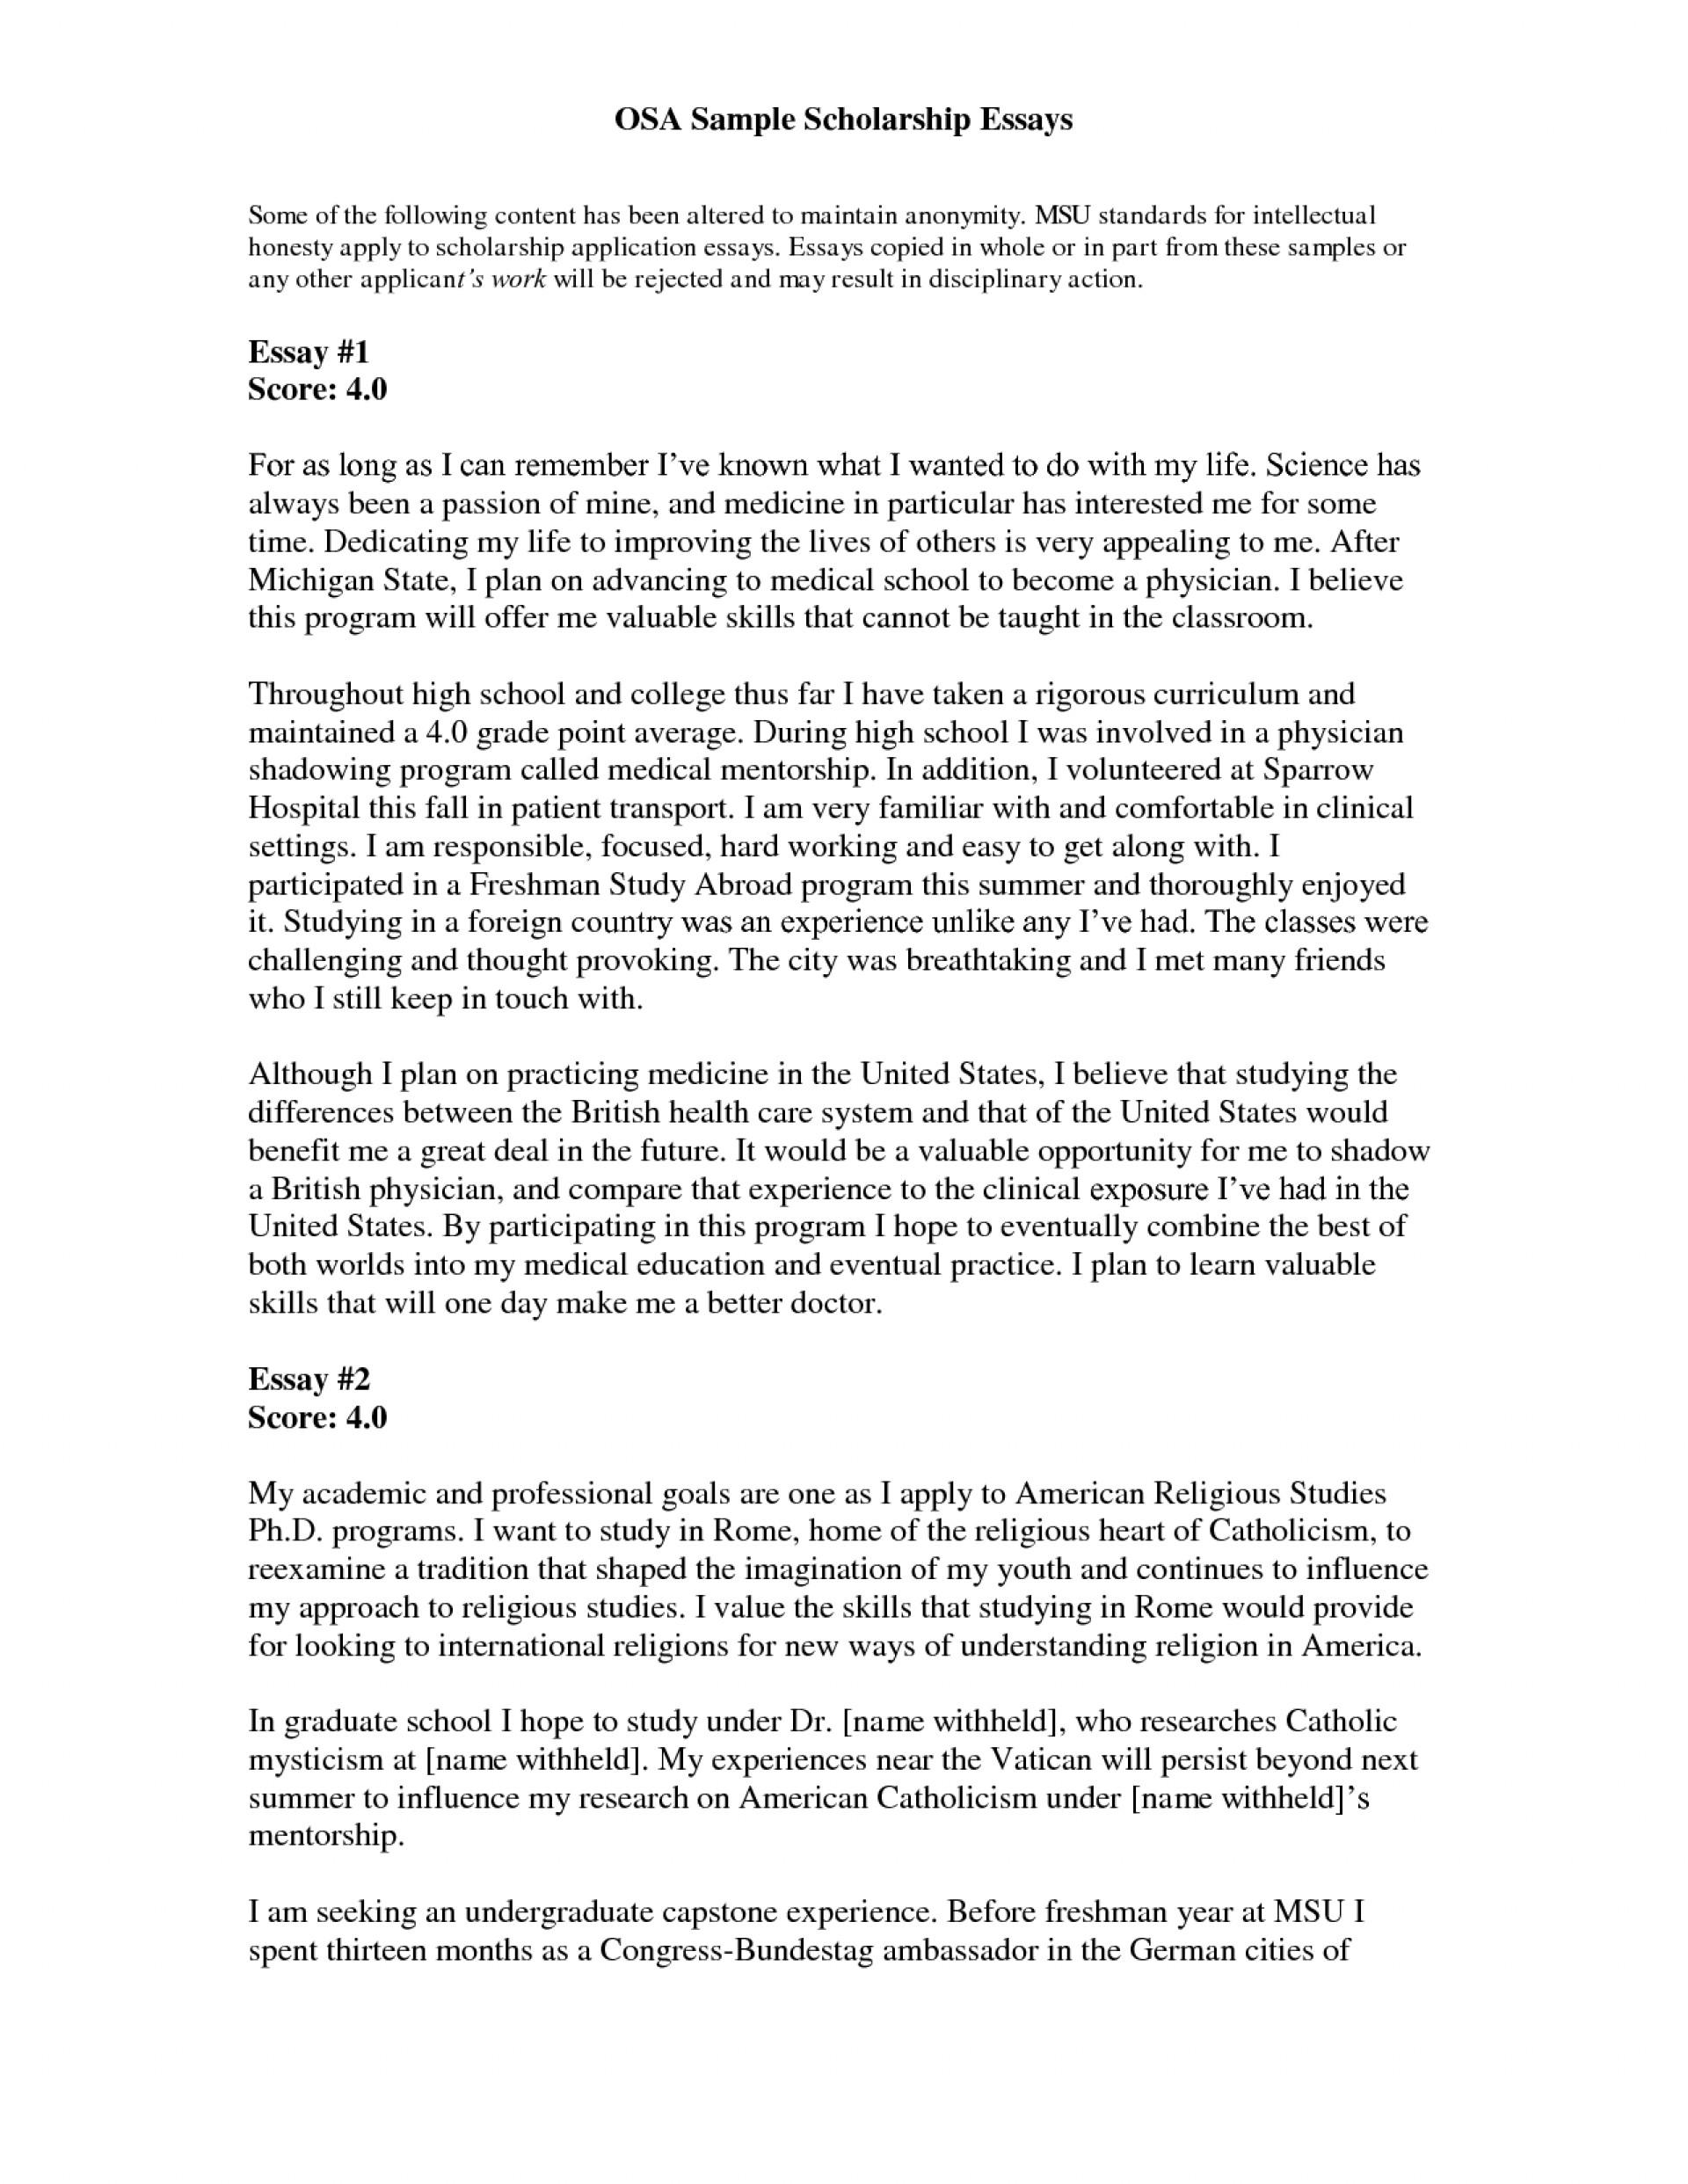 008 Ynt0sledfv Sample Essay For Scholarship Incredible Mara Personal Pdf 1920